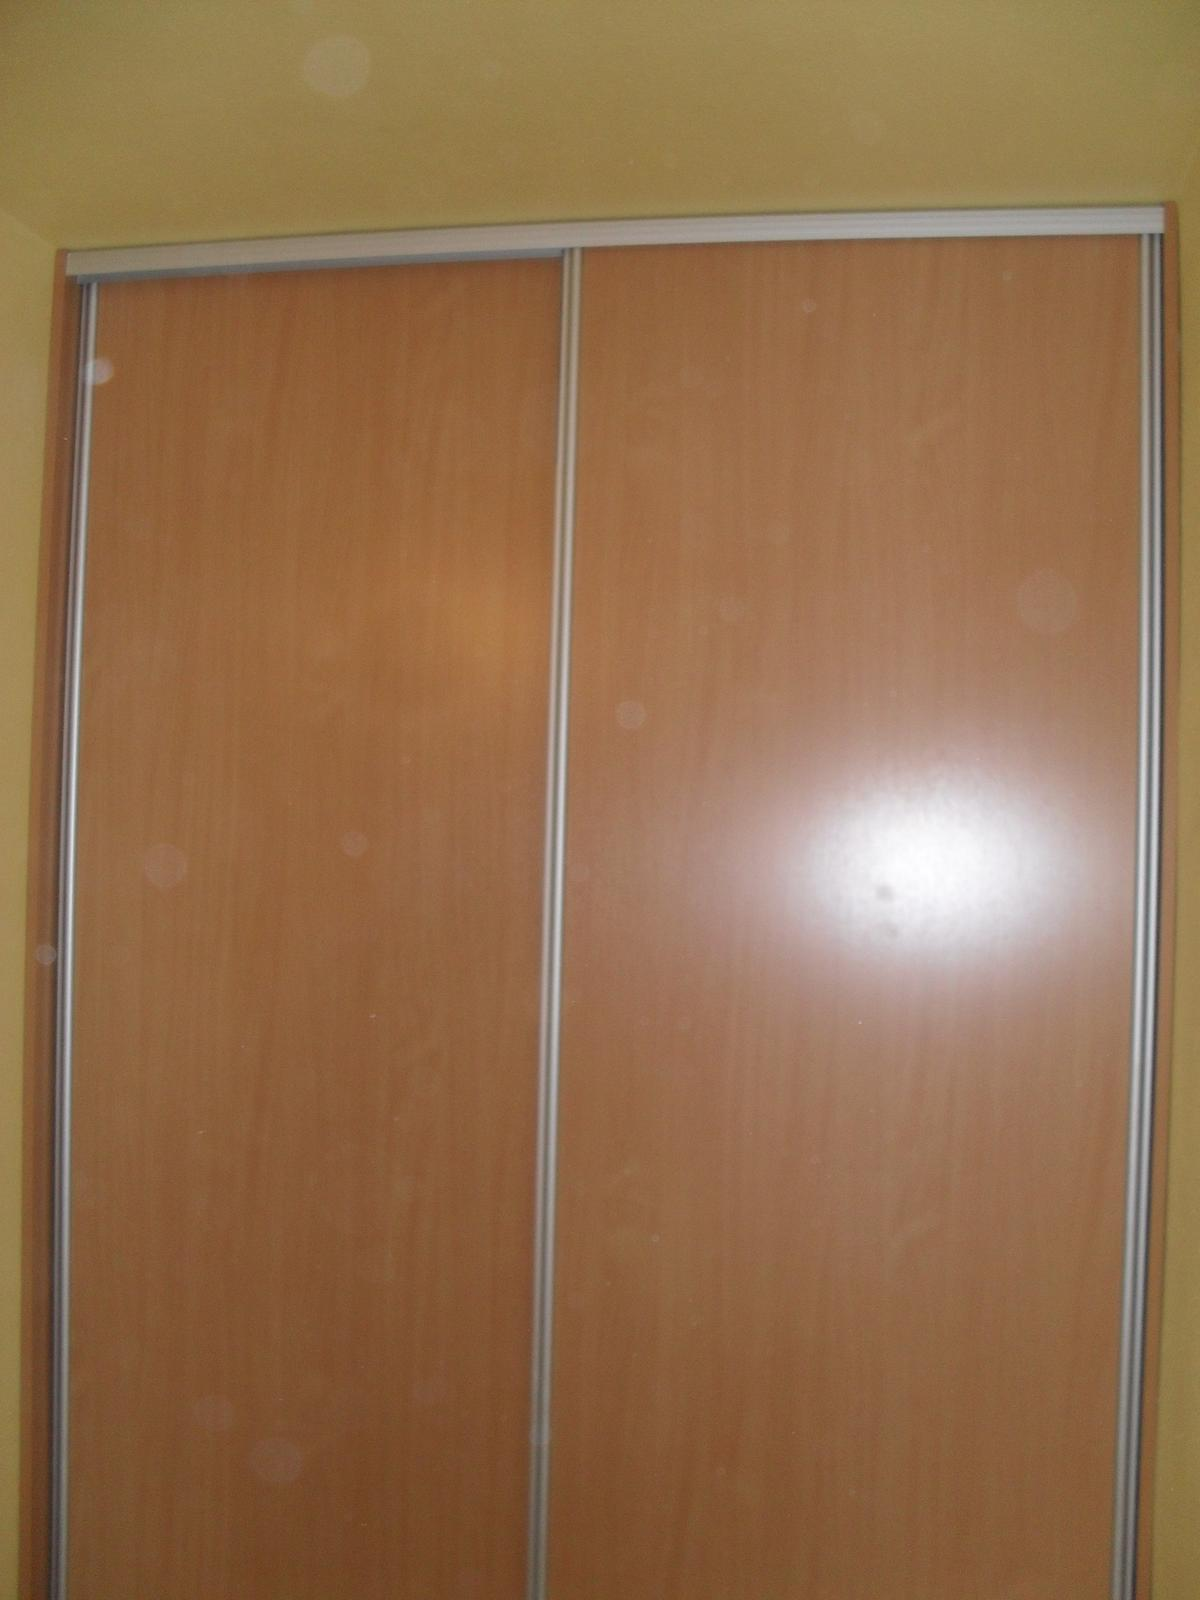 Vstavané skrine Martin Benko Bošany - Obrázok č. 68